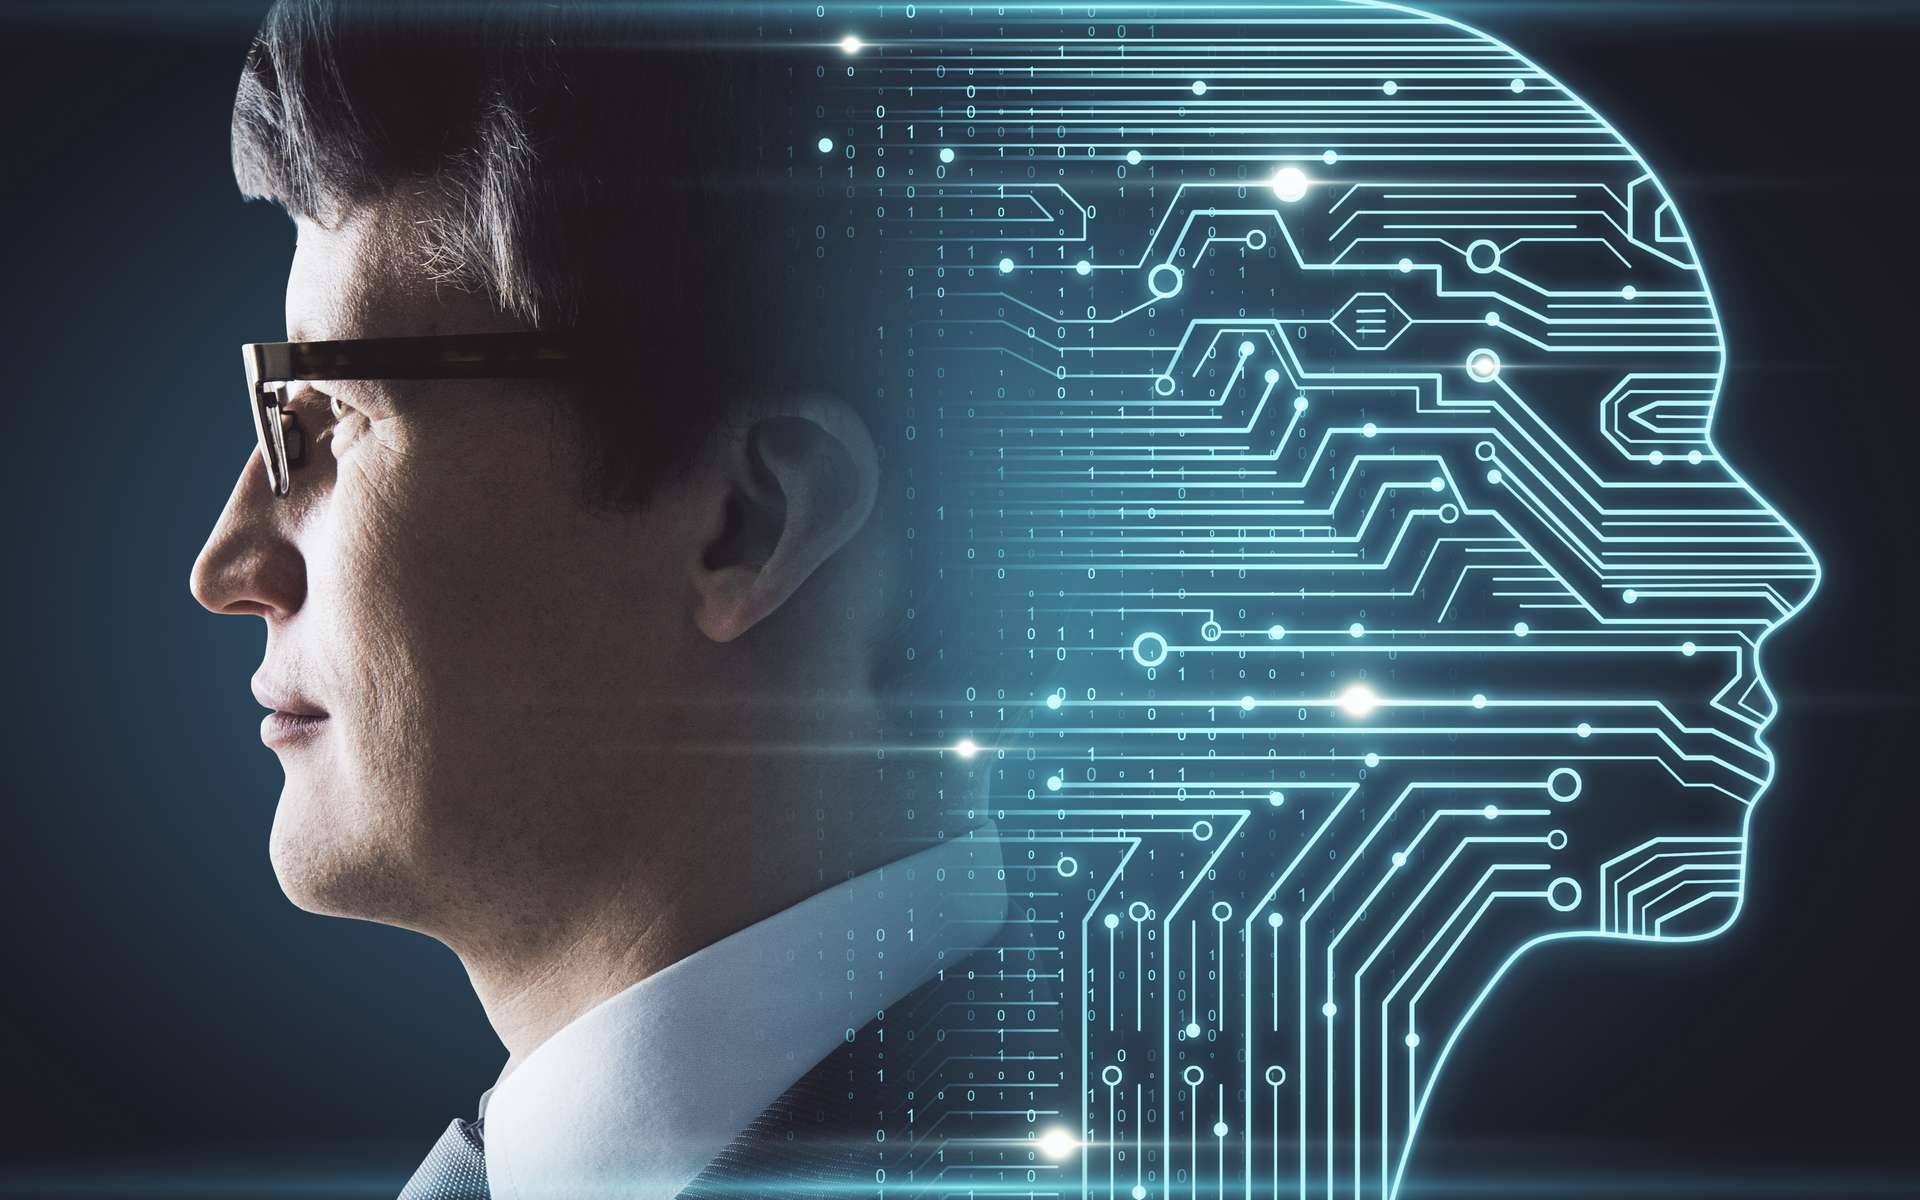 Microsoft utilise l'intelligence artificielle pour détecter les deepfakes. © peshkov, Adobe stock